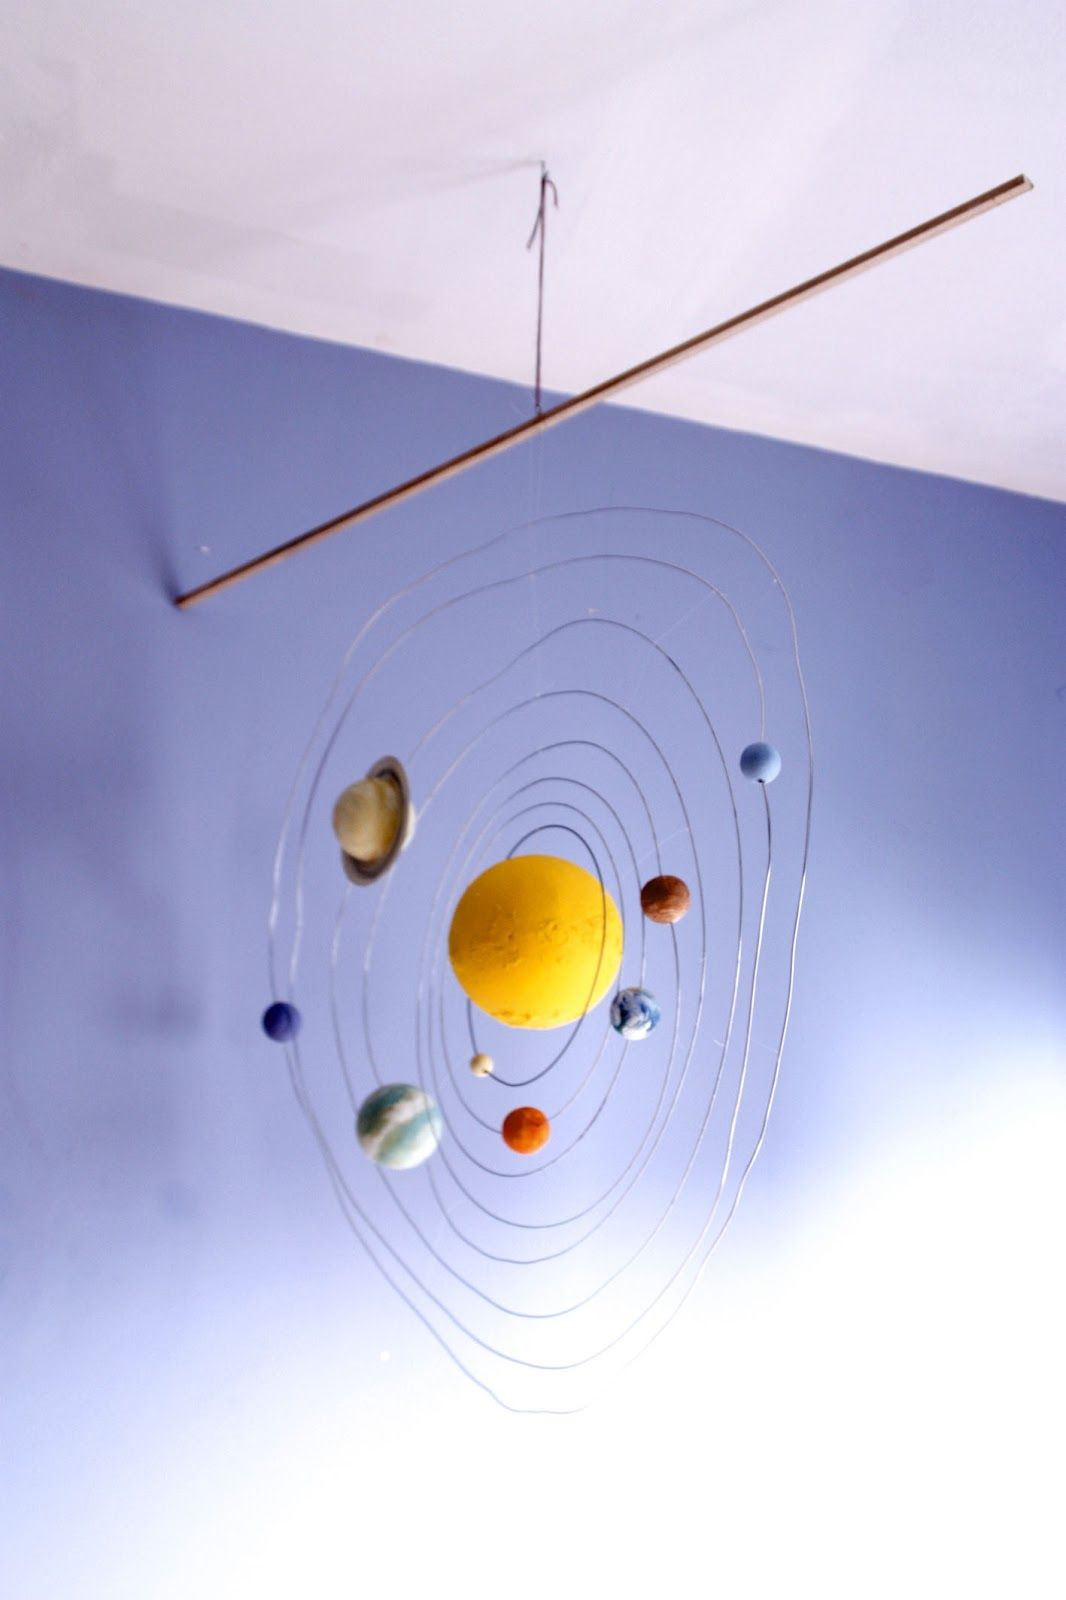 Pintalalluna Sistema Solar 02 Diy Pinterest Solar System